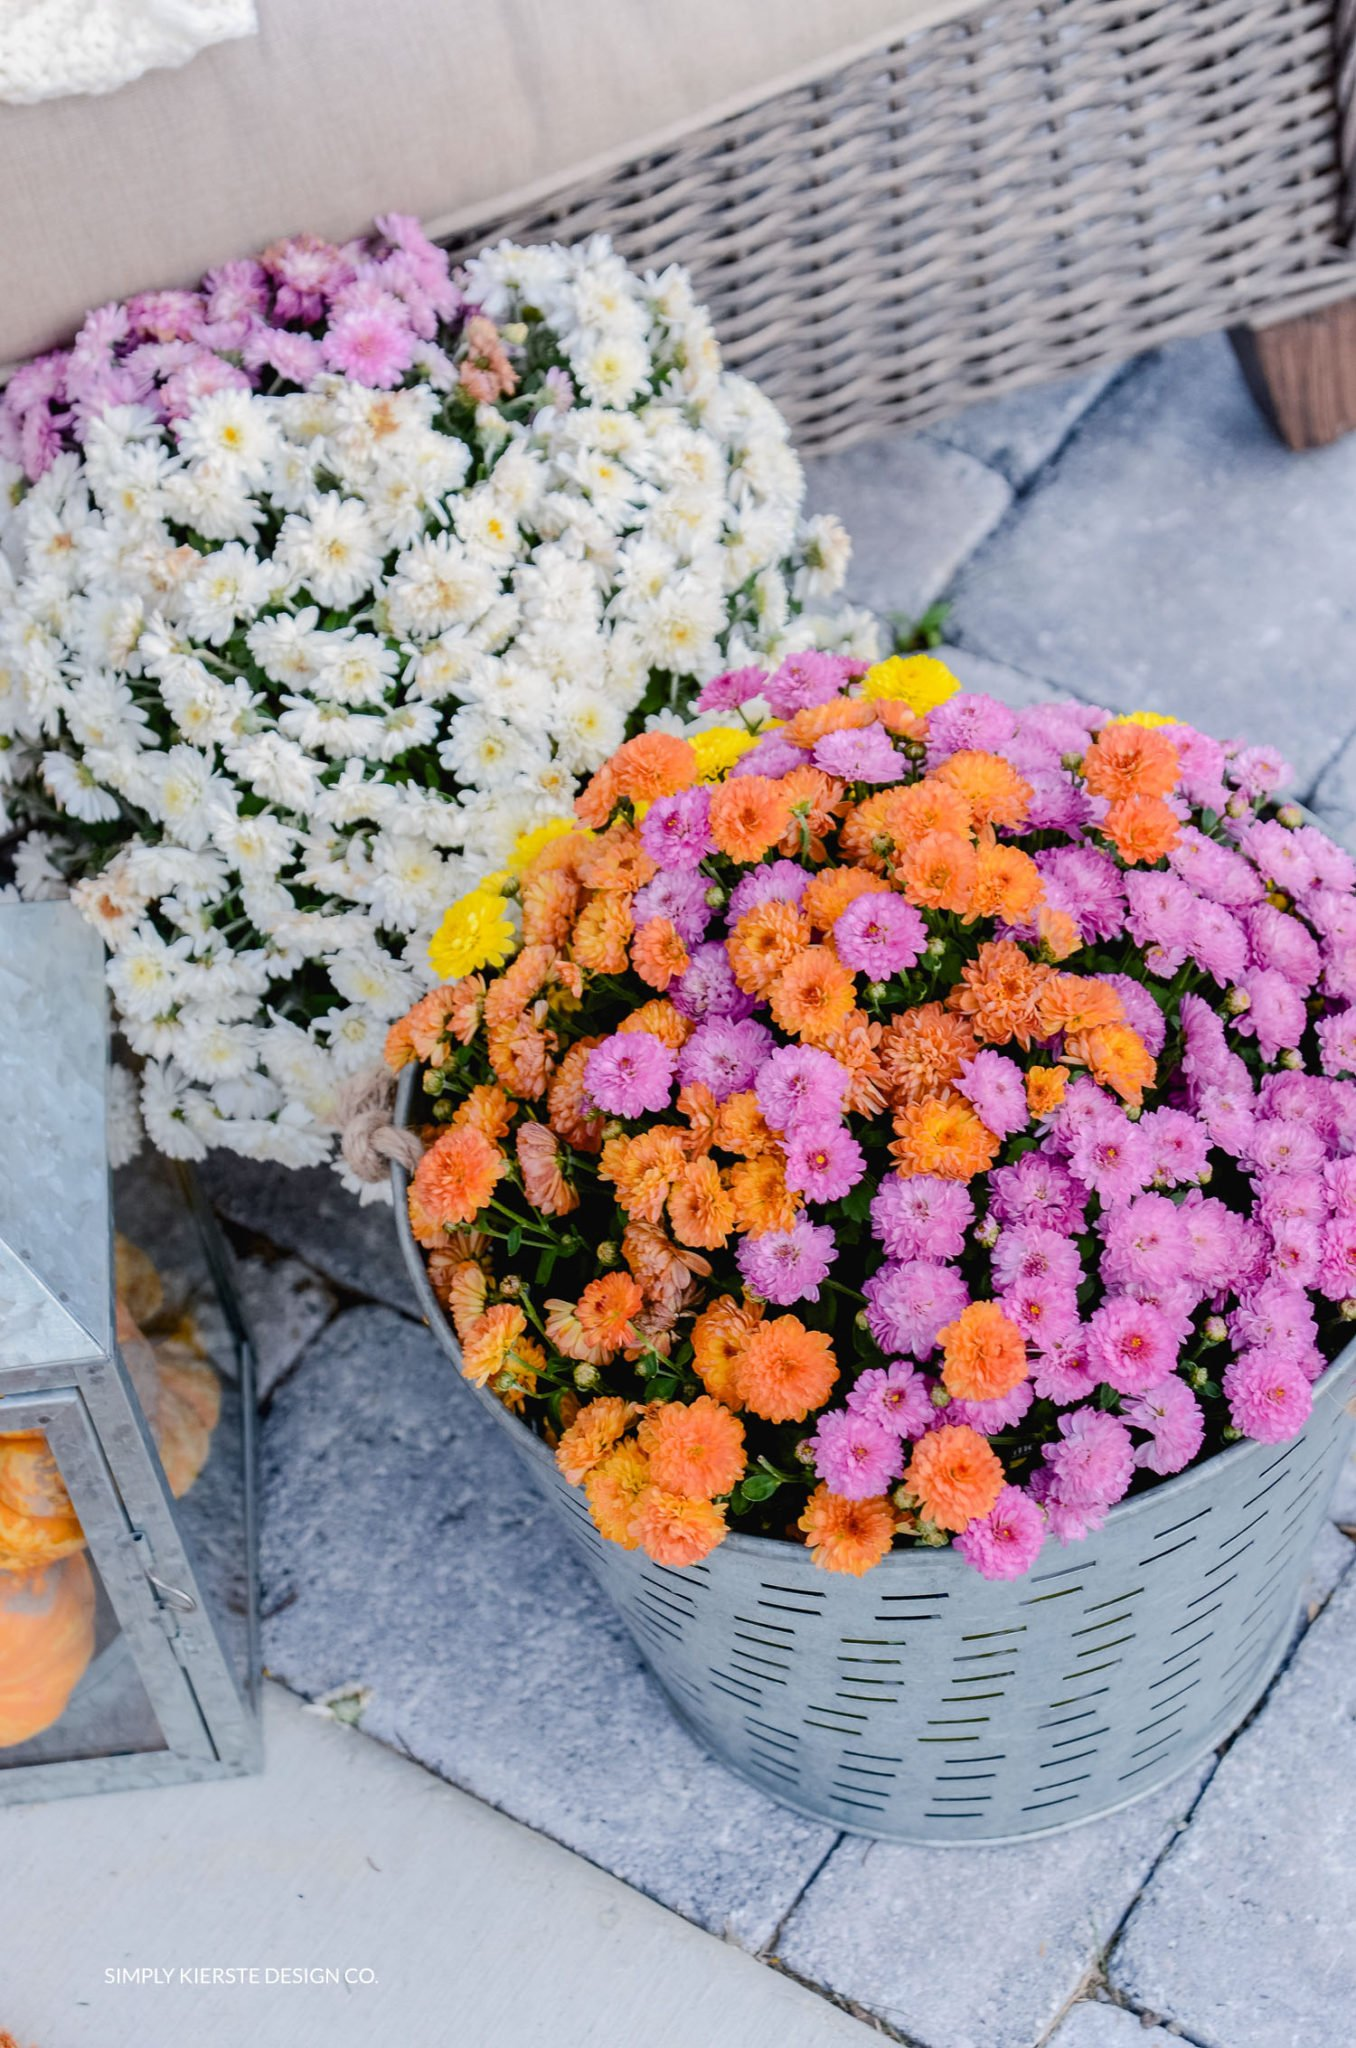 Simple Fall Porch | Better Homes & Gardens | Mums | simplykierste.com